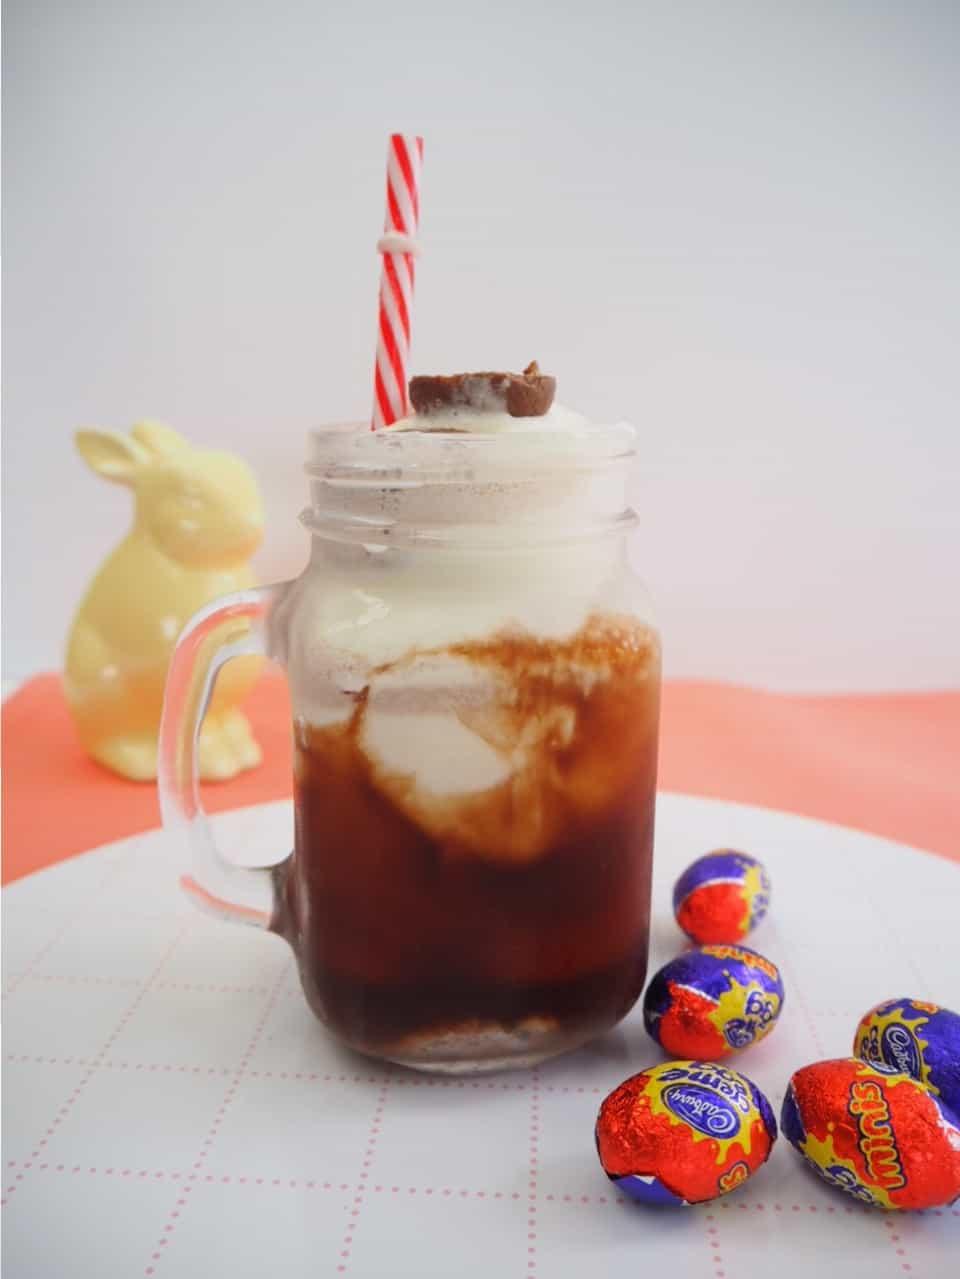 An Easter milkshake recipe made with Cadbury creme eggs